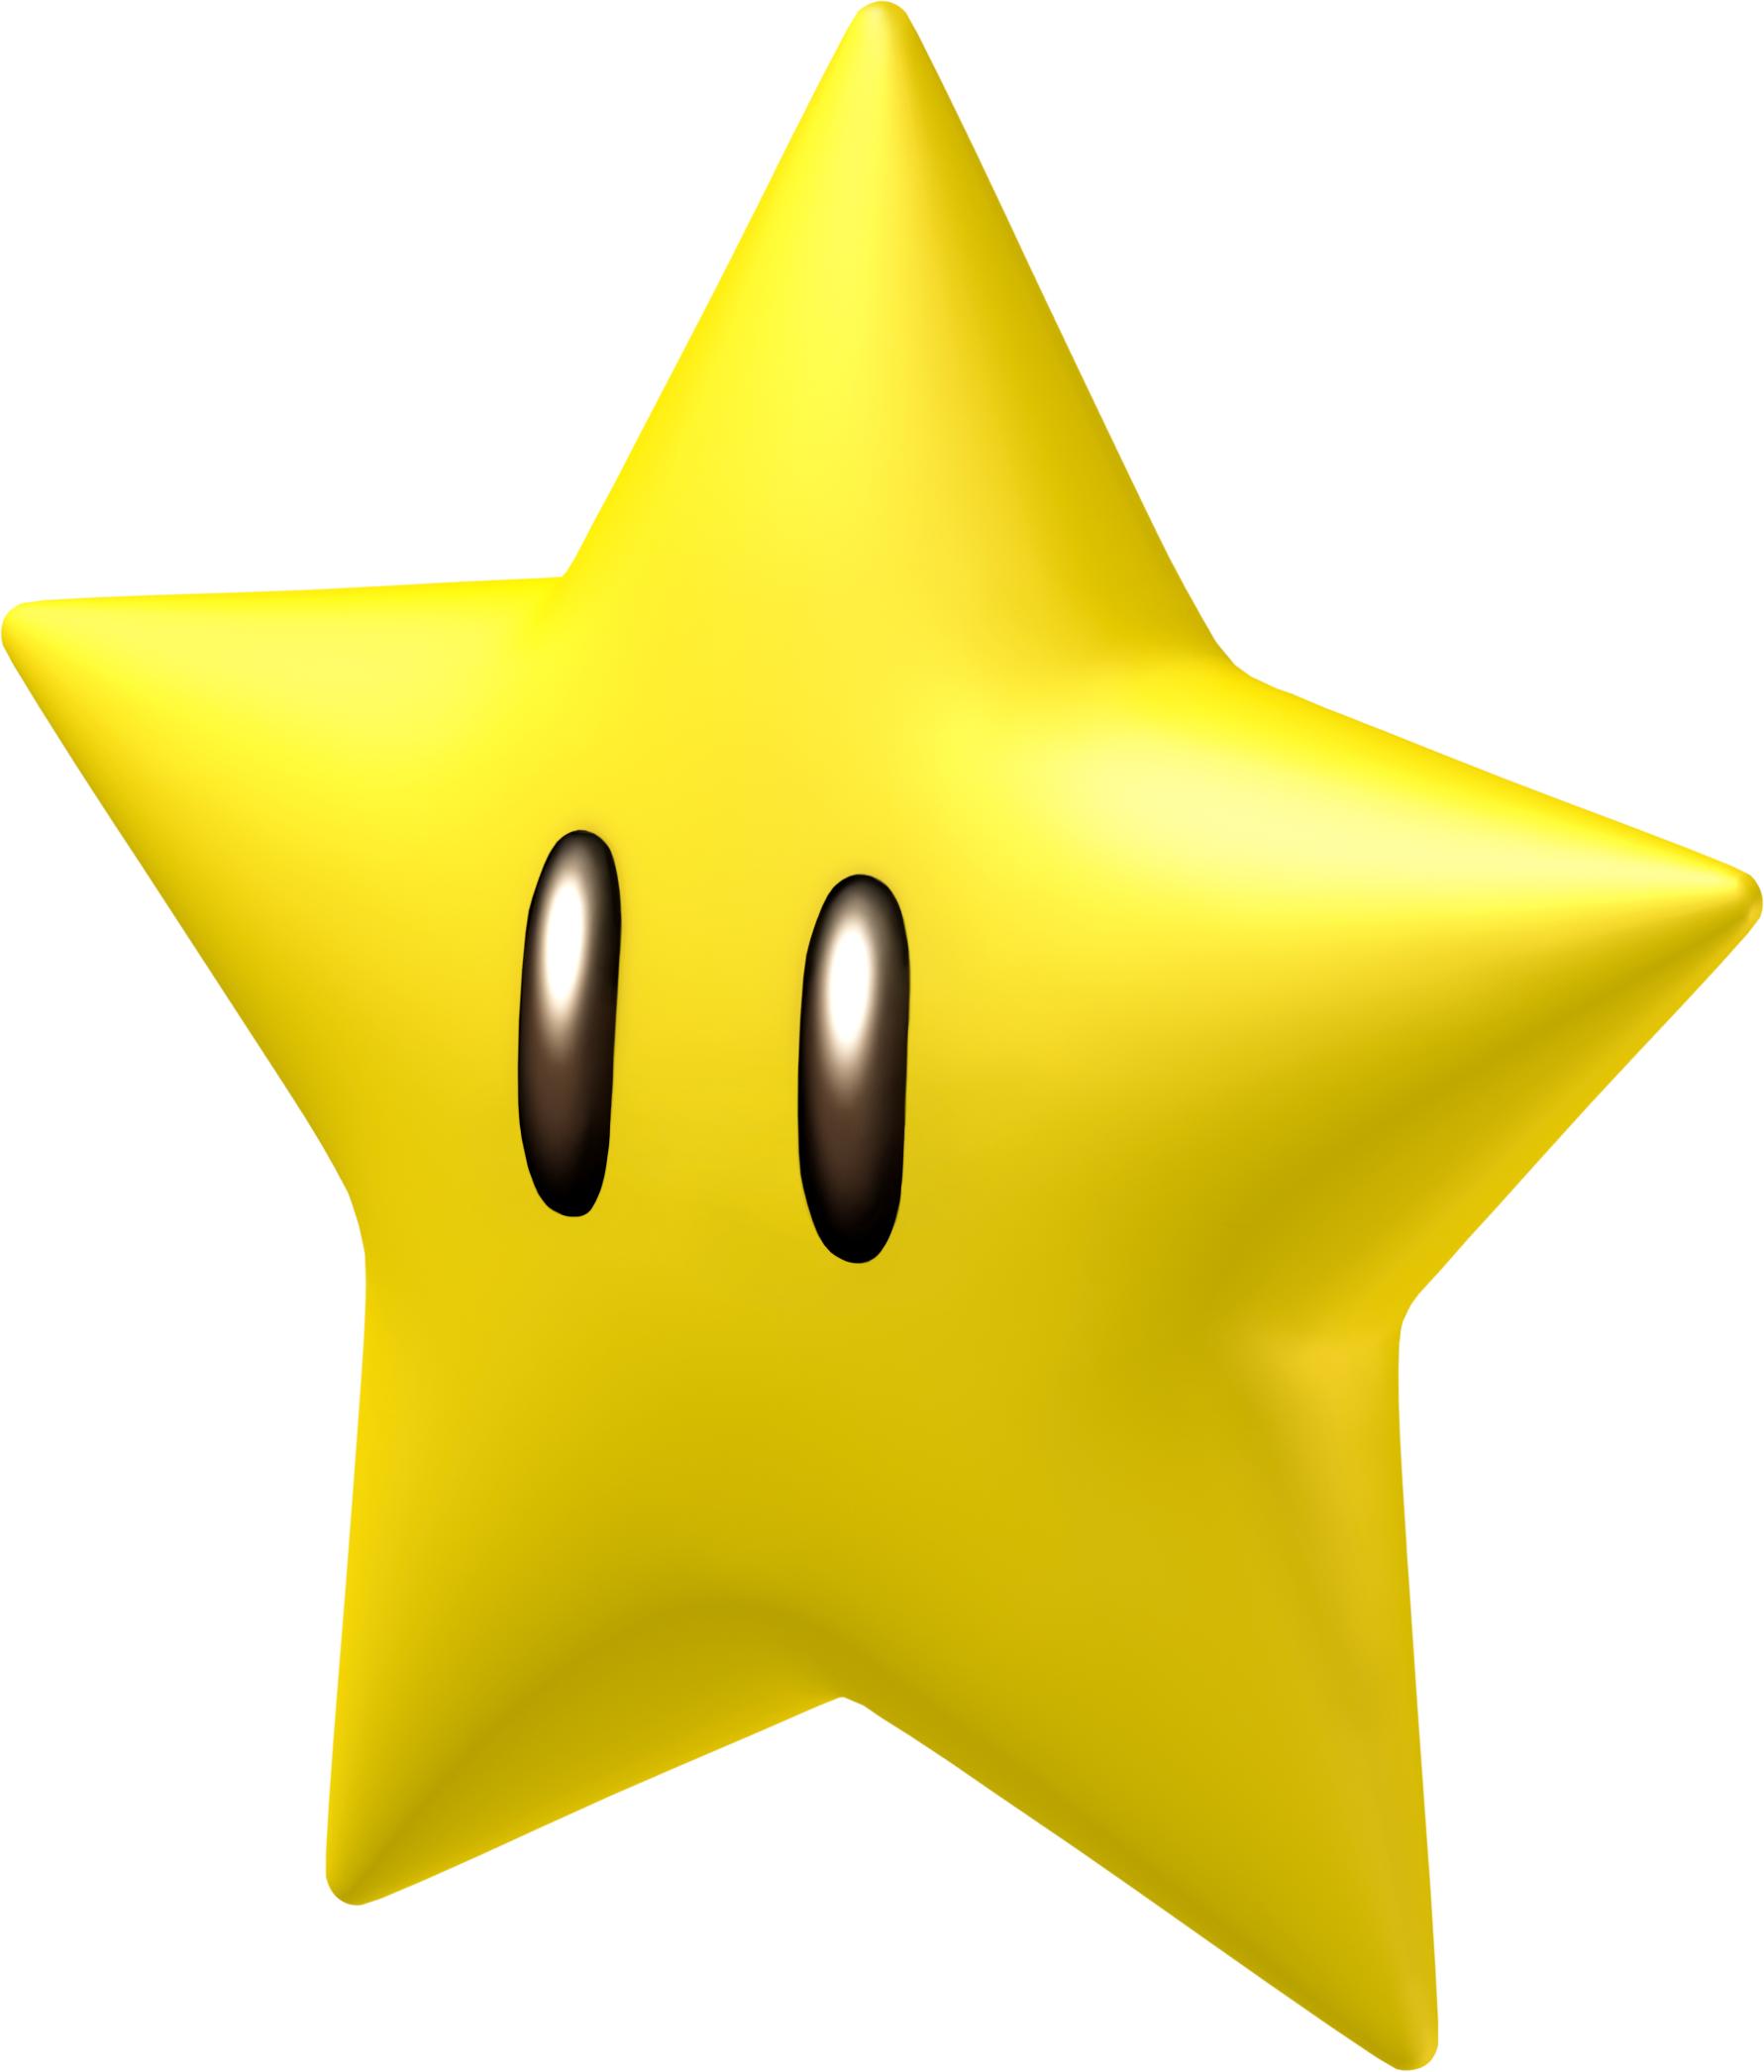 Blue super star clipart jpg transparent download Mario star clipart blue - ClipartFest jpg transparent download